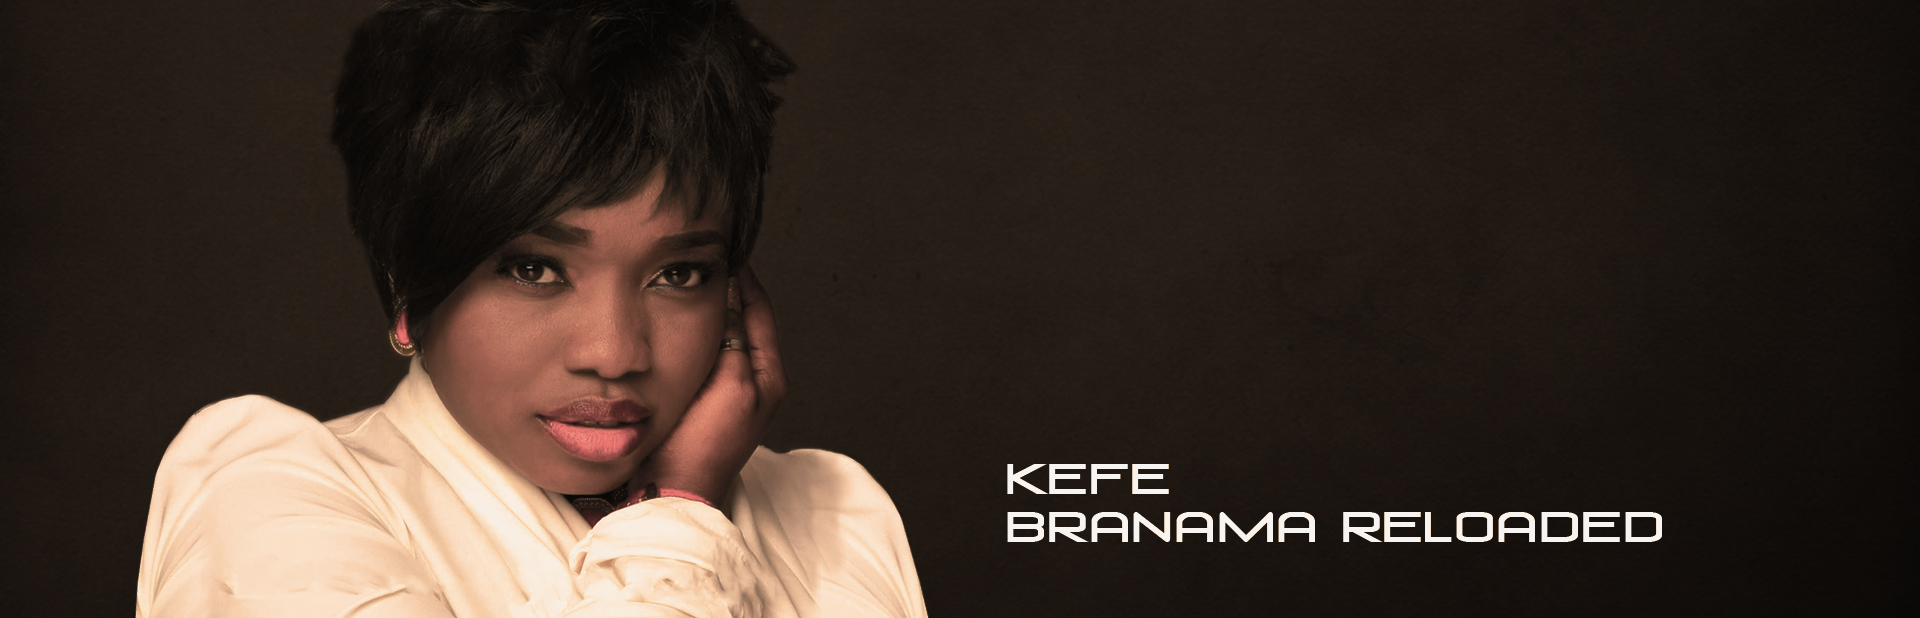 KEFE_Branama-reloaded